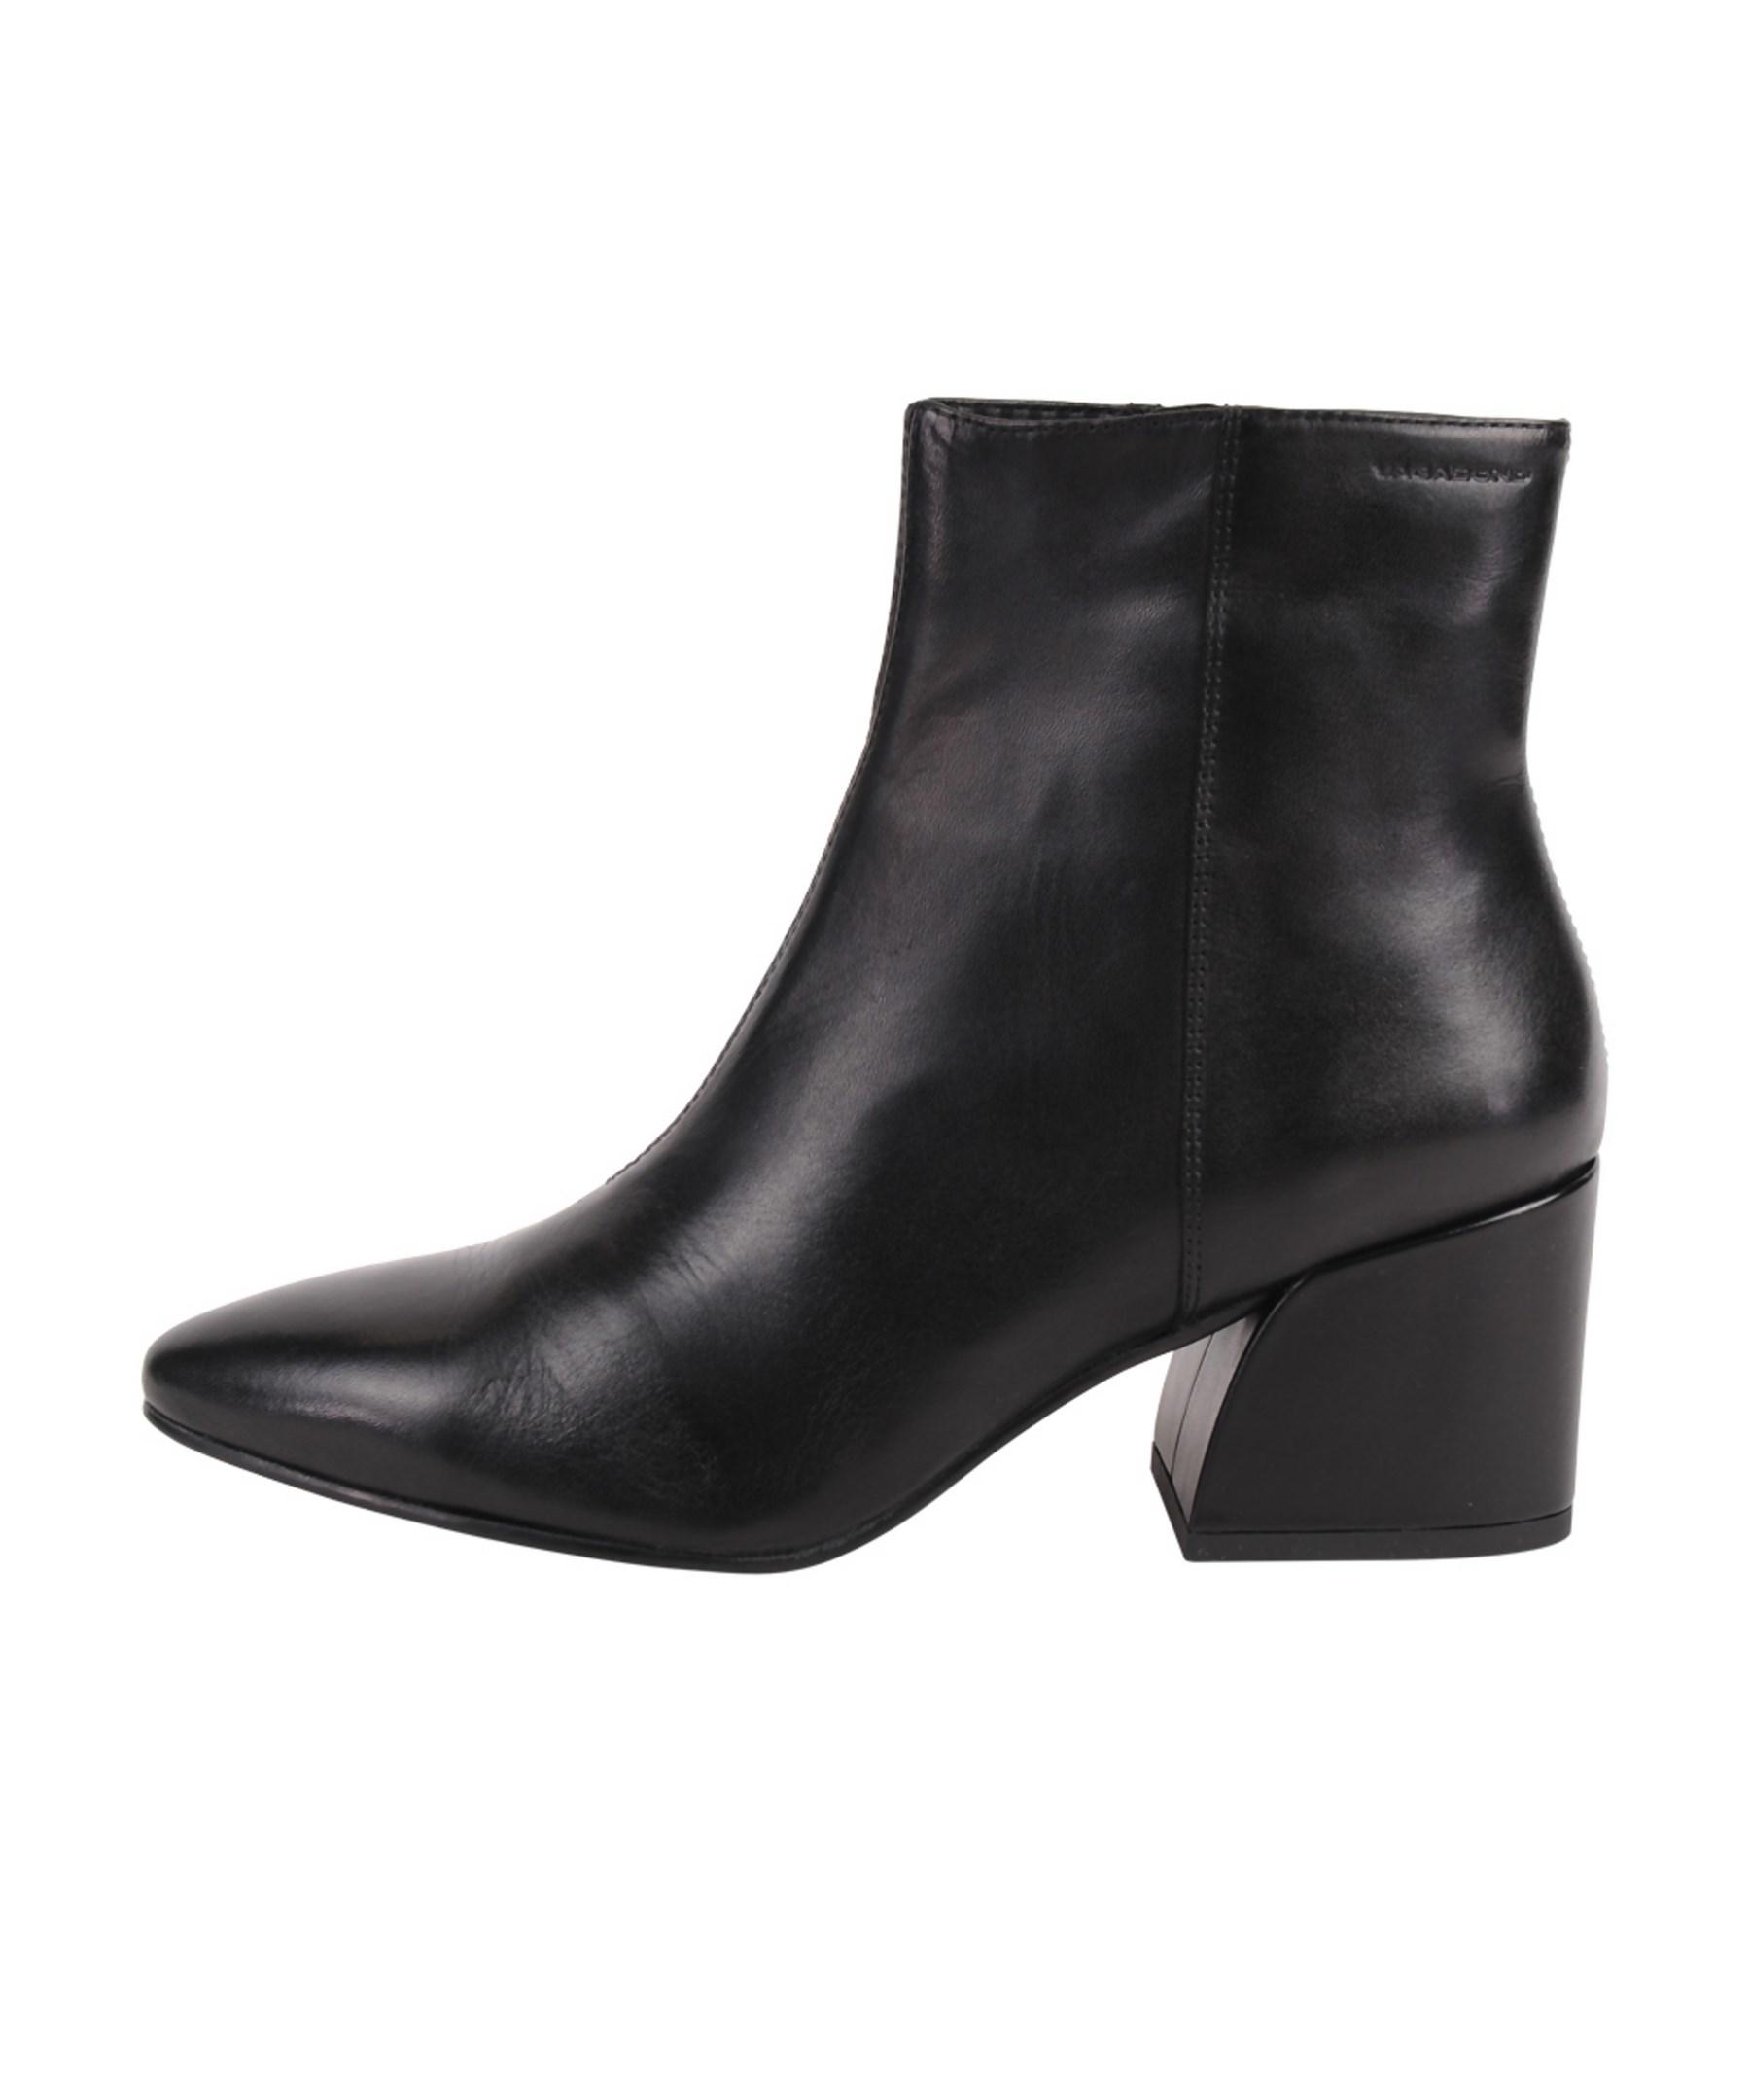 vagabond saida chelsea boots in black lyst. Black Bedroom Furniture Sets. Home Design Ideas